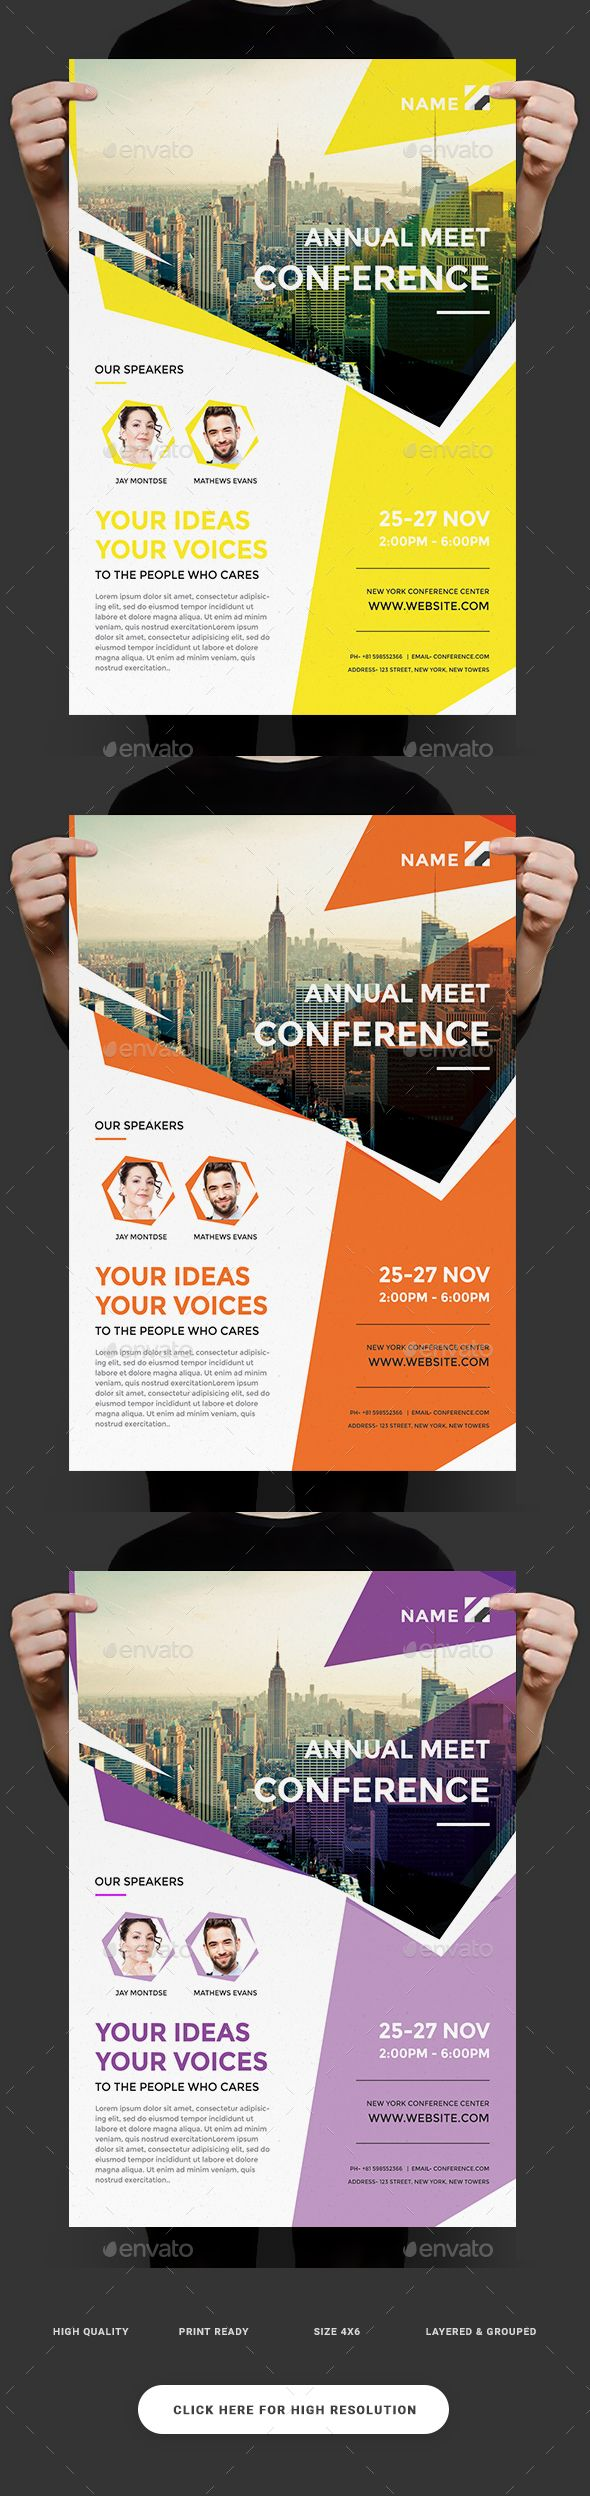 3 panel poster board designs - 3 Panel Poster Board Designs Event Summit Conference Flyer Event Invitation Designevent Poster Download